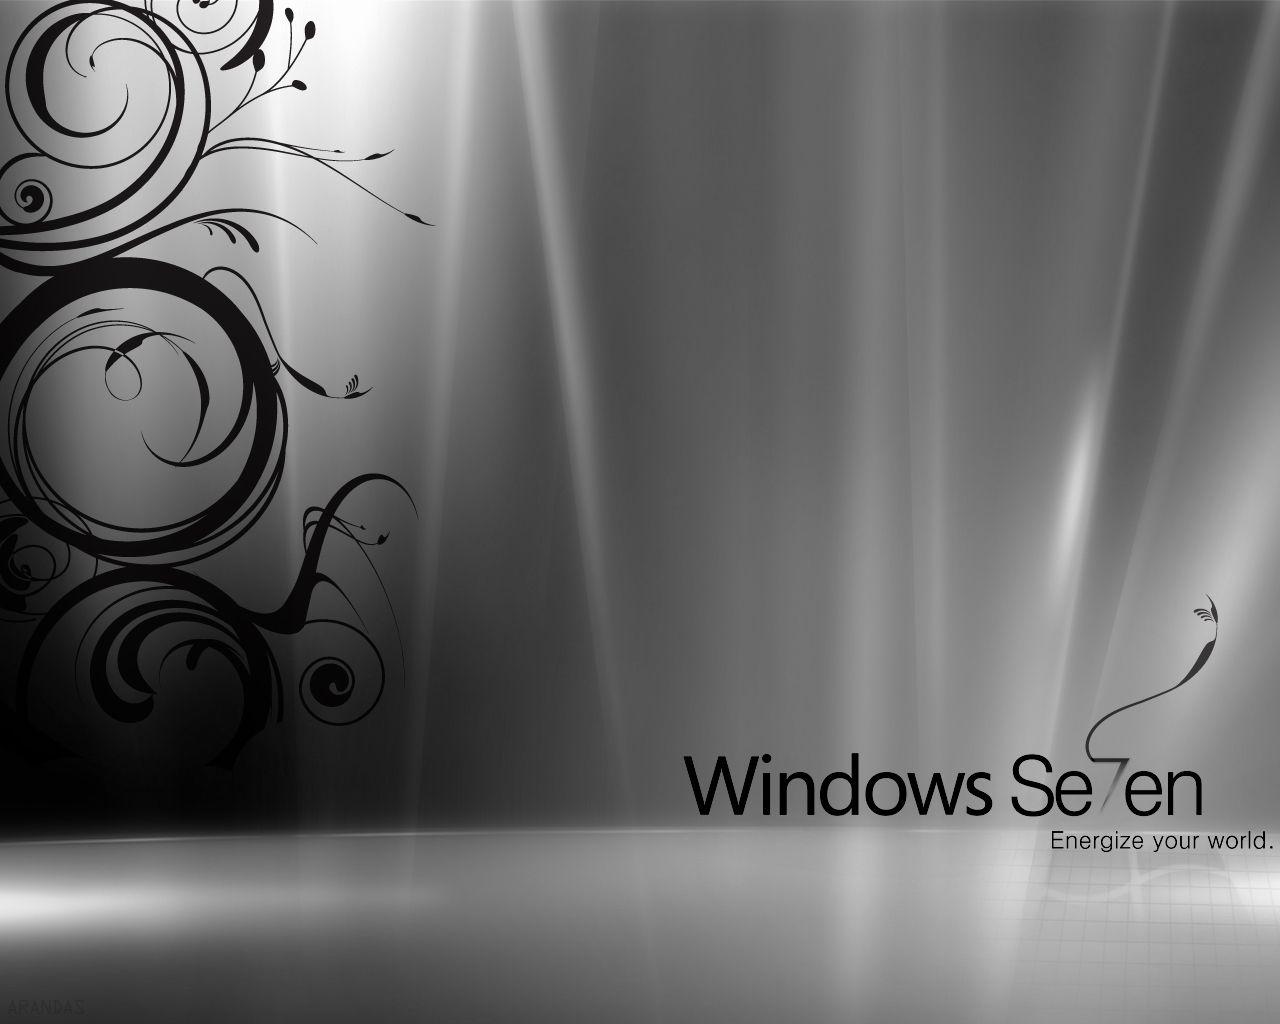 http://2.bp.blogspot.com/-zdsXcWZdeDo/UC-cbOc2FPI/AAAAAAAAAMw/2vBdWqKuIJA/s1600/Windows_7_ultimate_collection_of_wallpapers.21.jpg